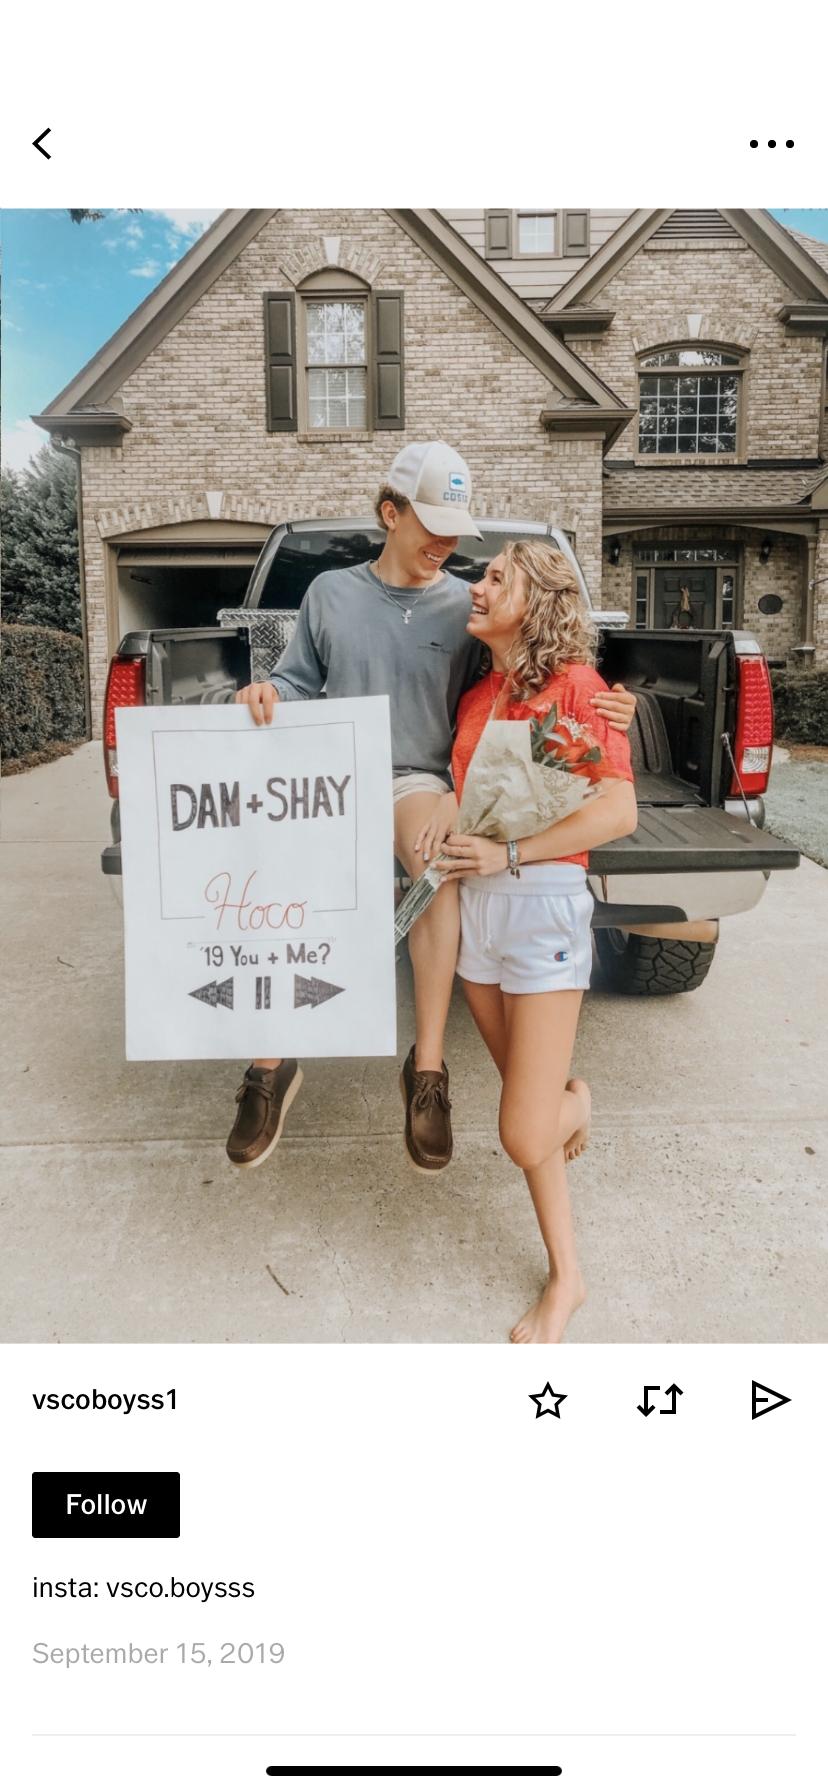 vsco dan + shay hoco / prom proposal  #hocoproposalsideasboyfriends